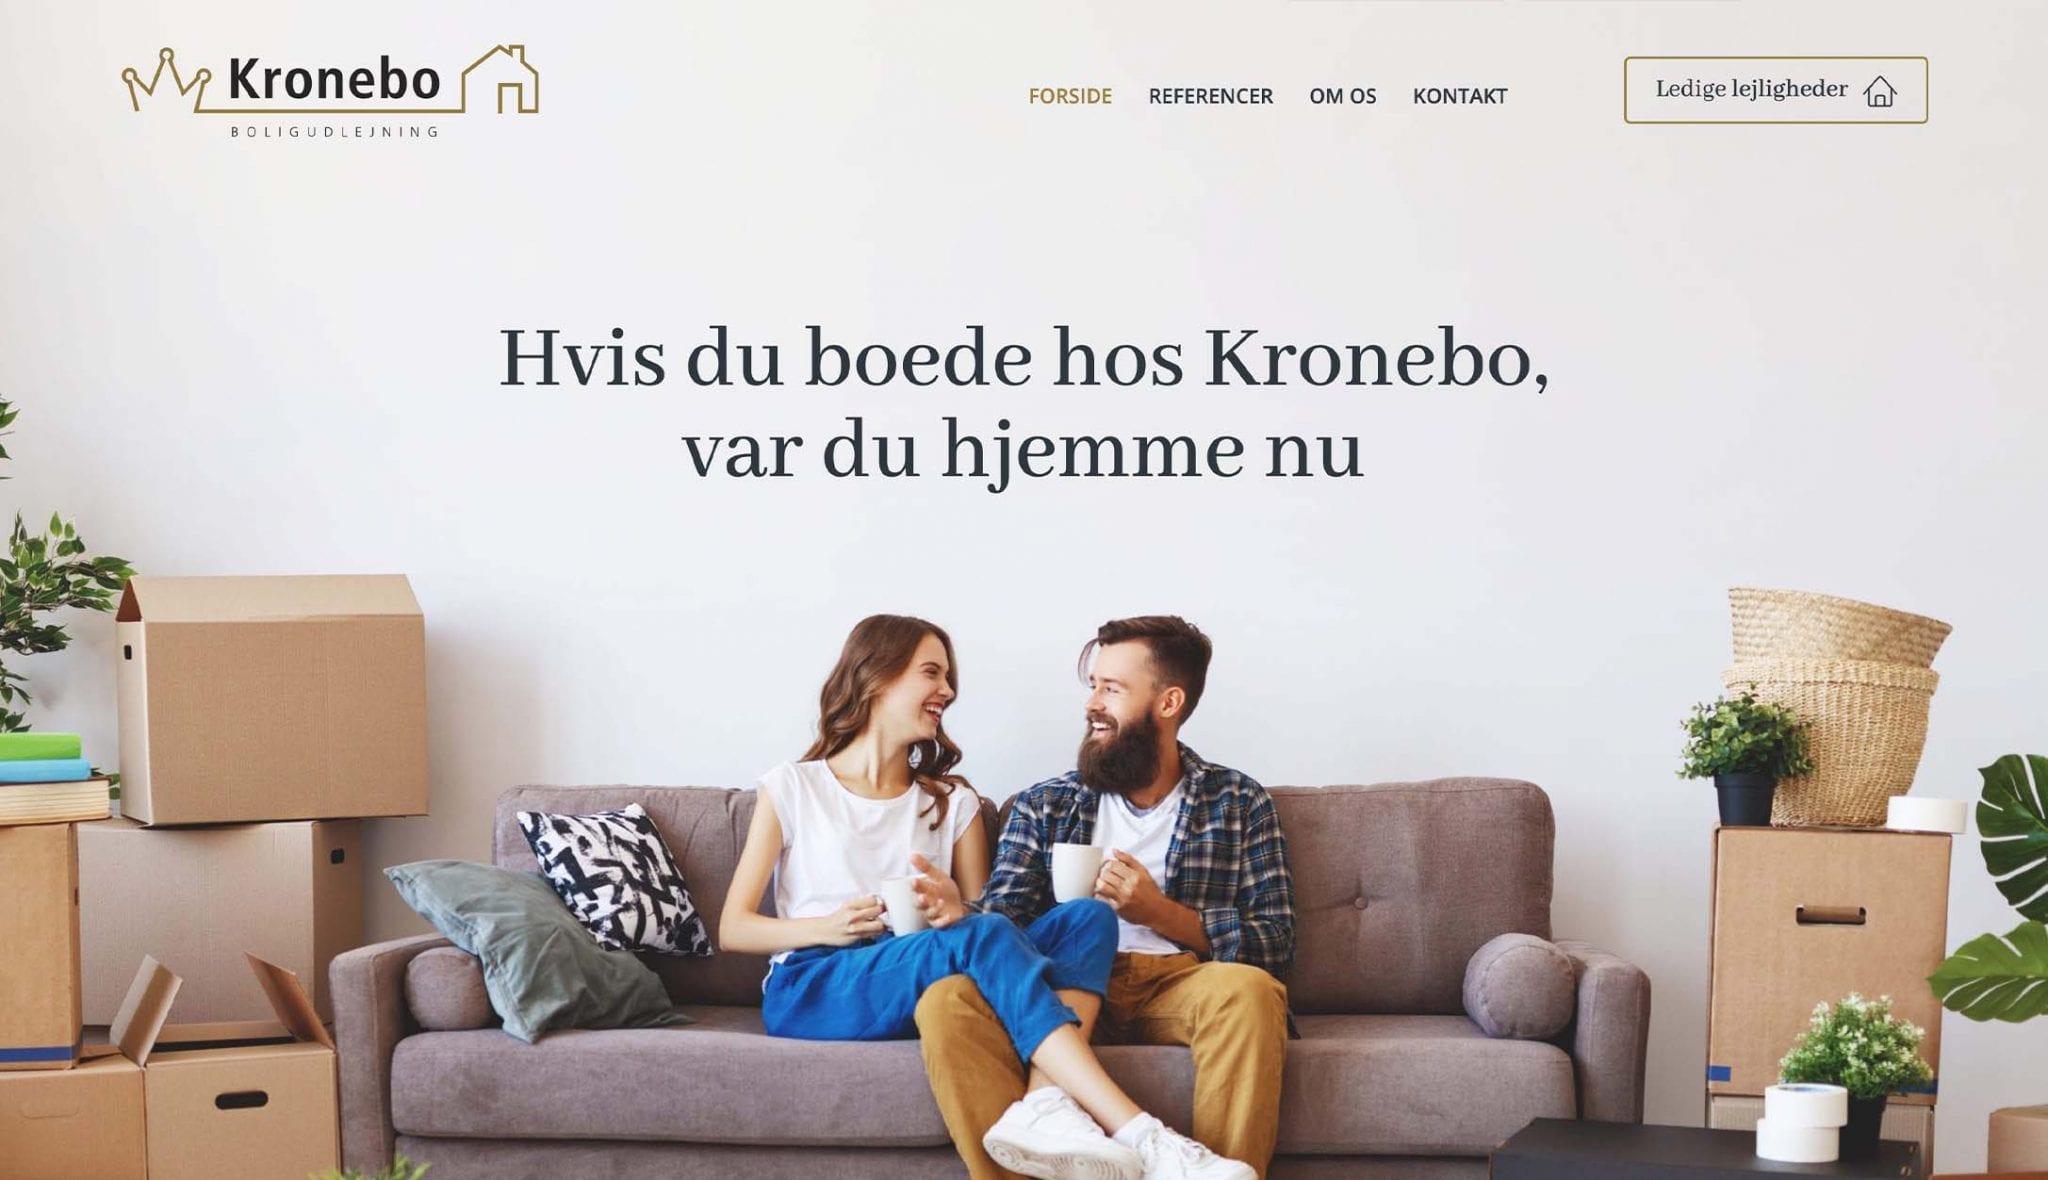 Kronebo